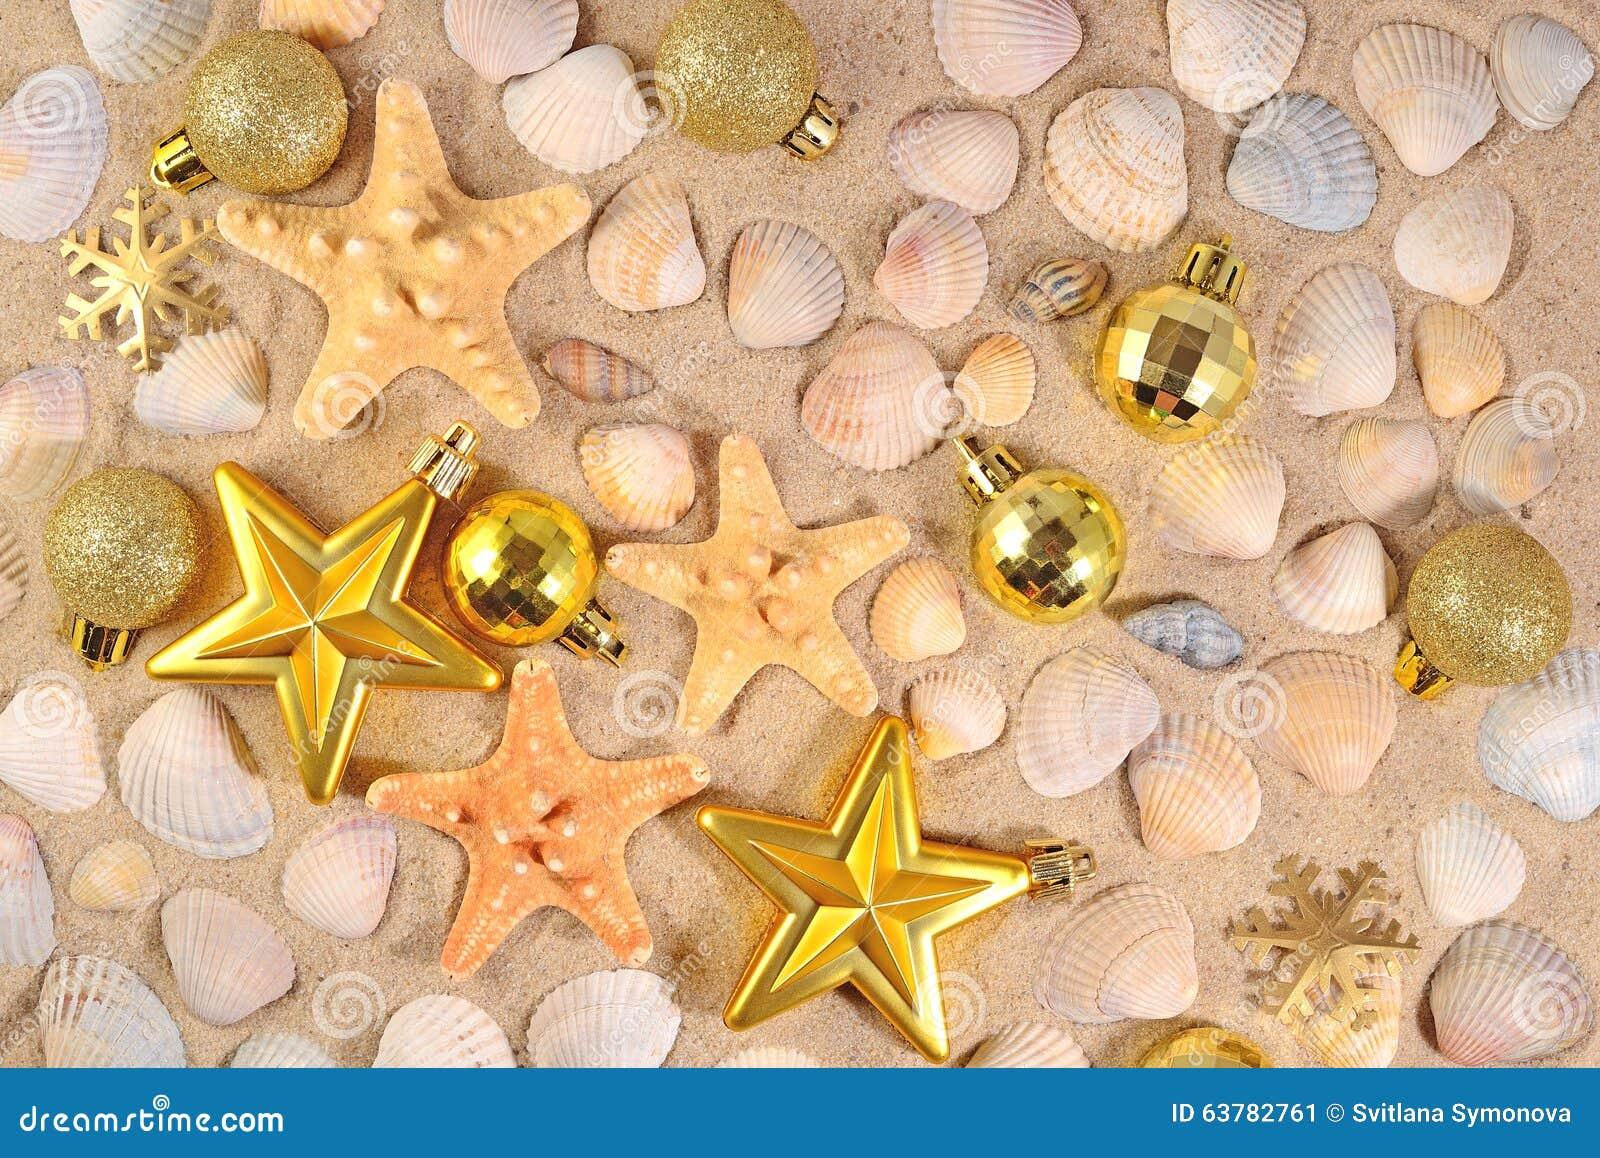 conchiglie per decorazioni: sticker conchiglie decorazione adesiva ... - Conchiglie Per Decorazioni